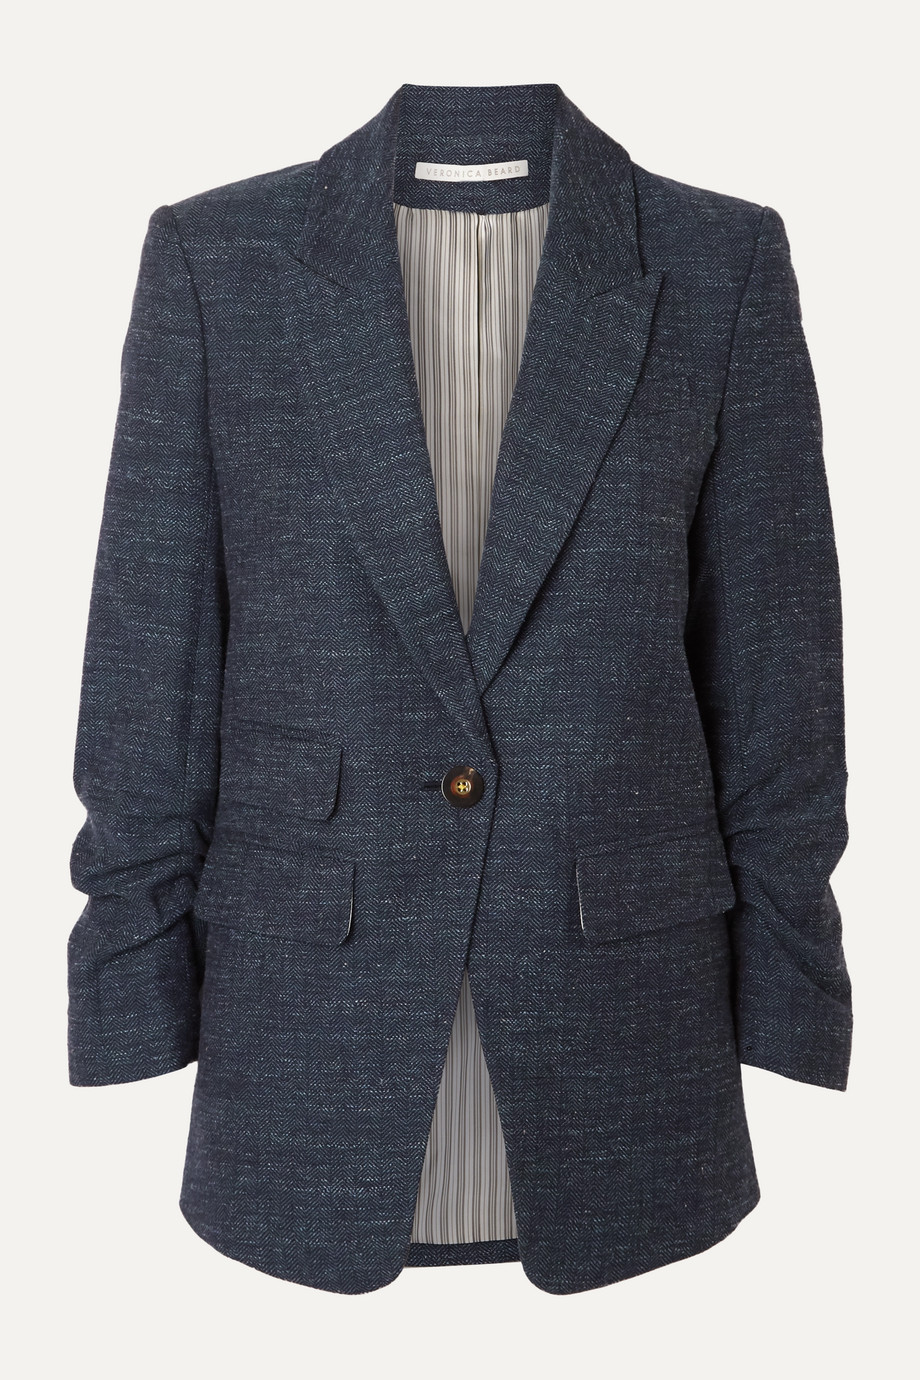 Veronica Beard Martel Dickey herringbone wool, cotton and linen-blend blazer